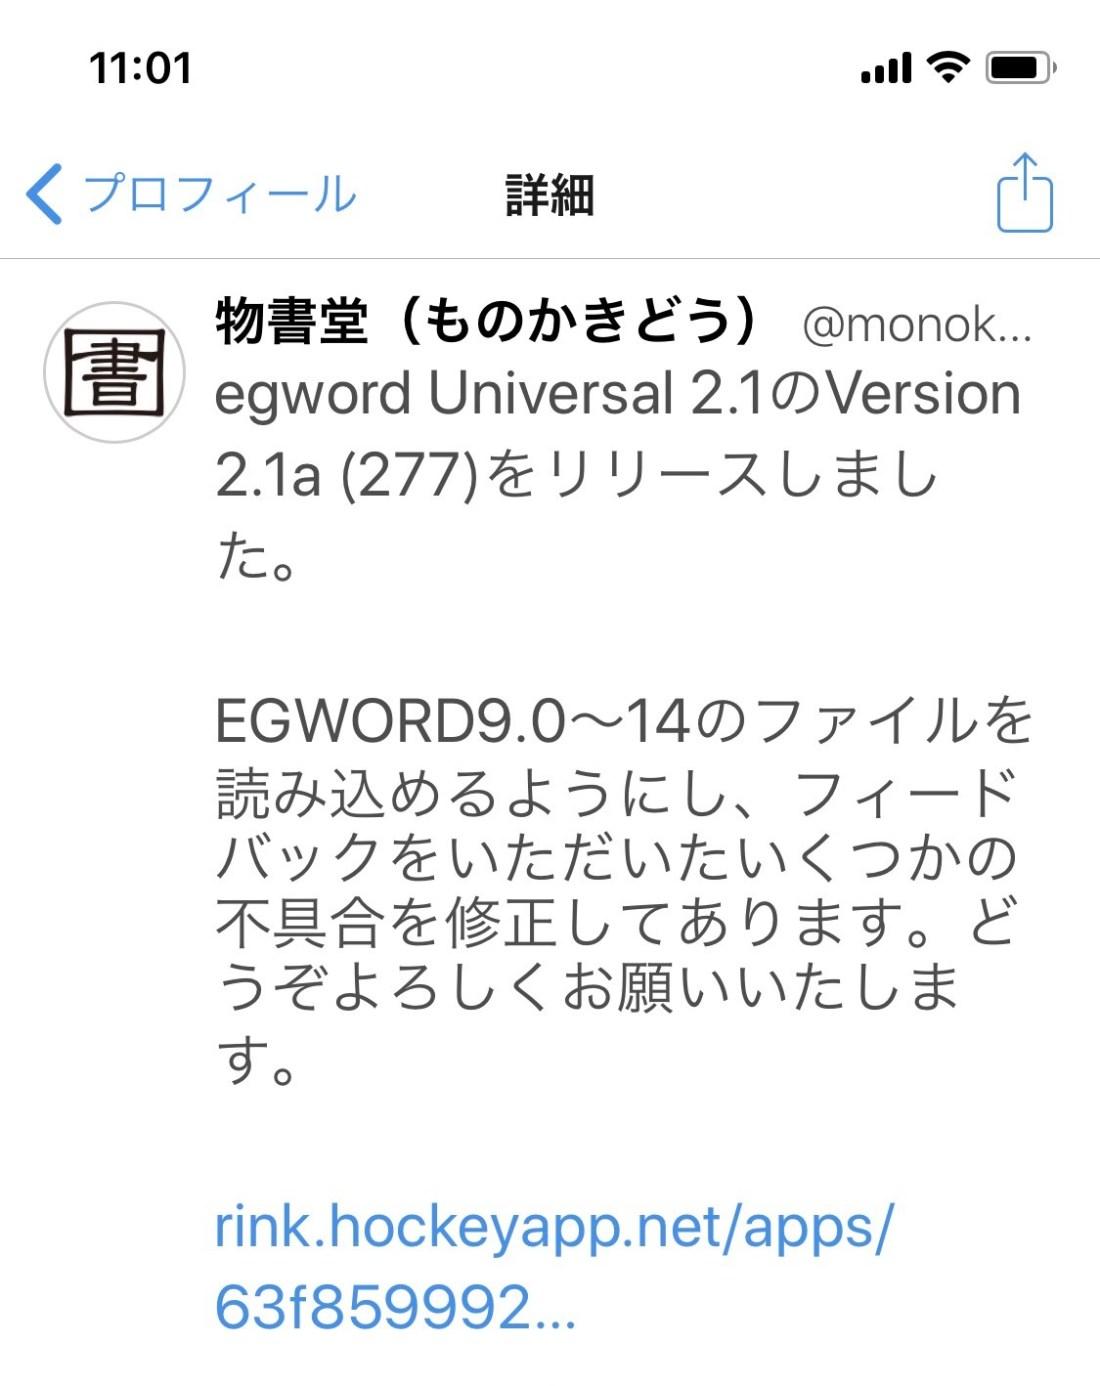 egword Universal 2.1 alpha release